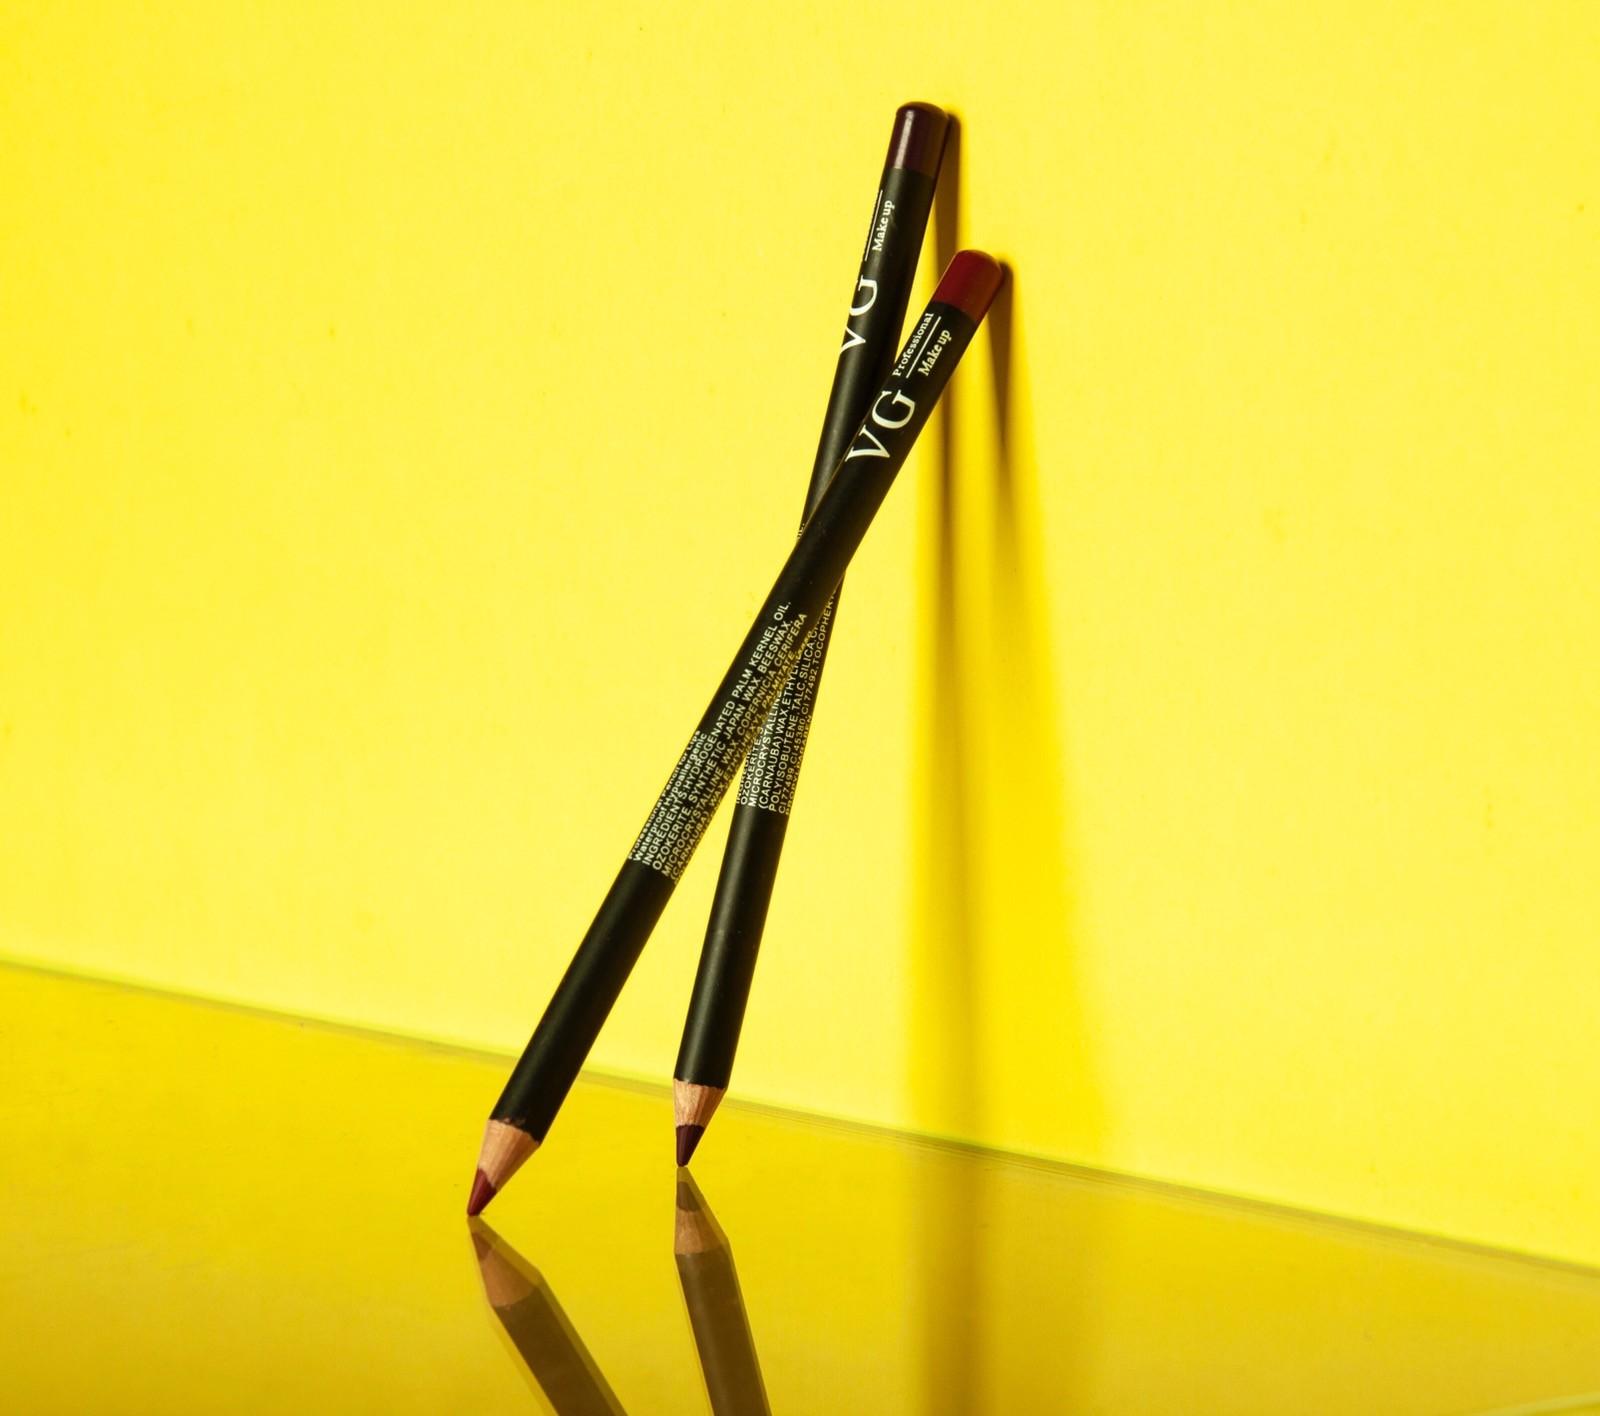 Спеццена на карандаши для глаз и губ ProVG в Украине